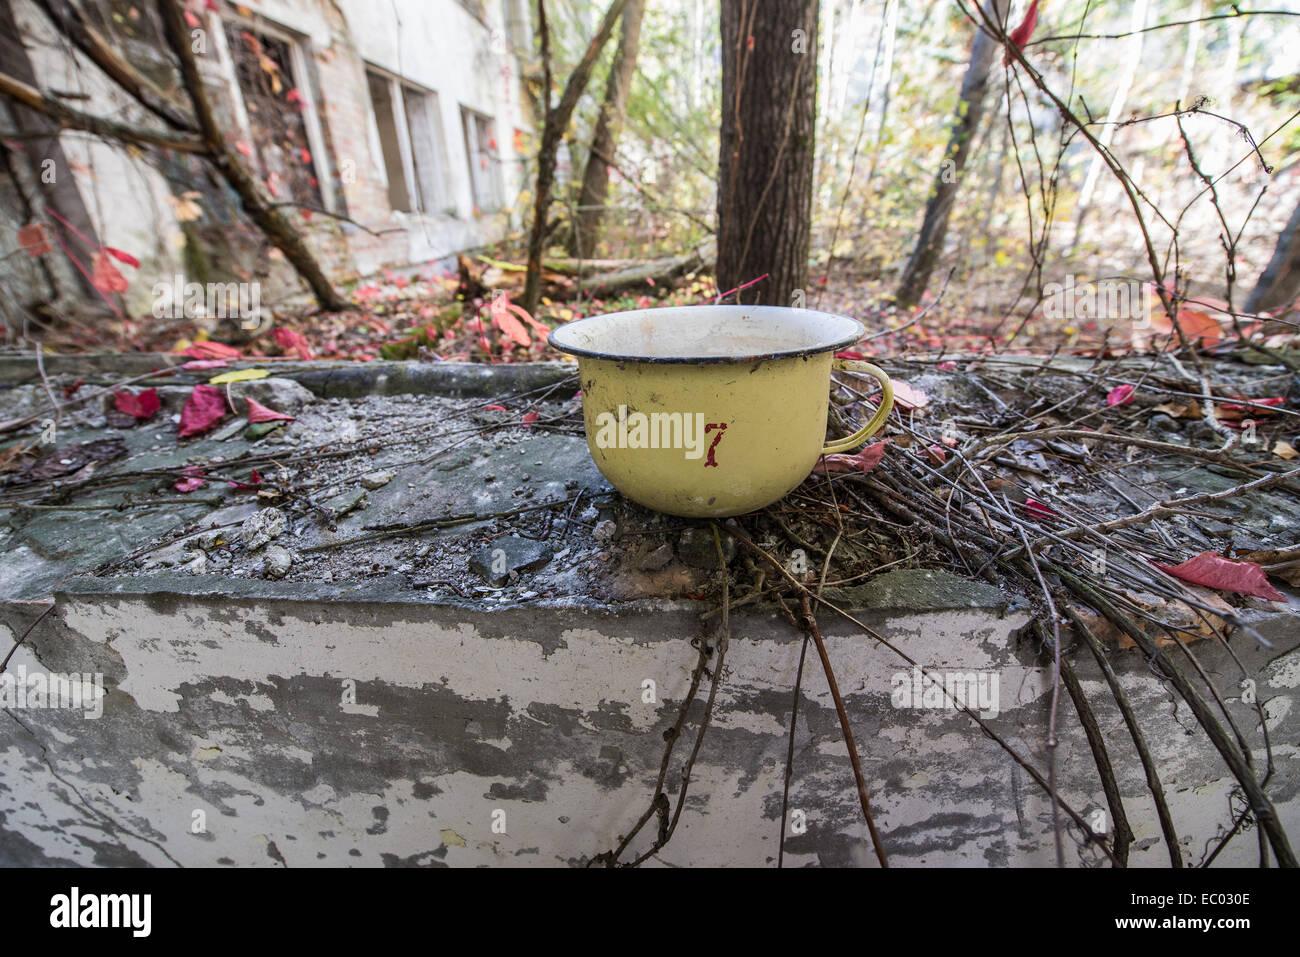 yellow metal potty in kindergarten 'Cheburashka' in Pripyat abandoned city, Chernobyl Exclusion Zone, Ukraine - Stock Image